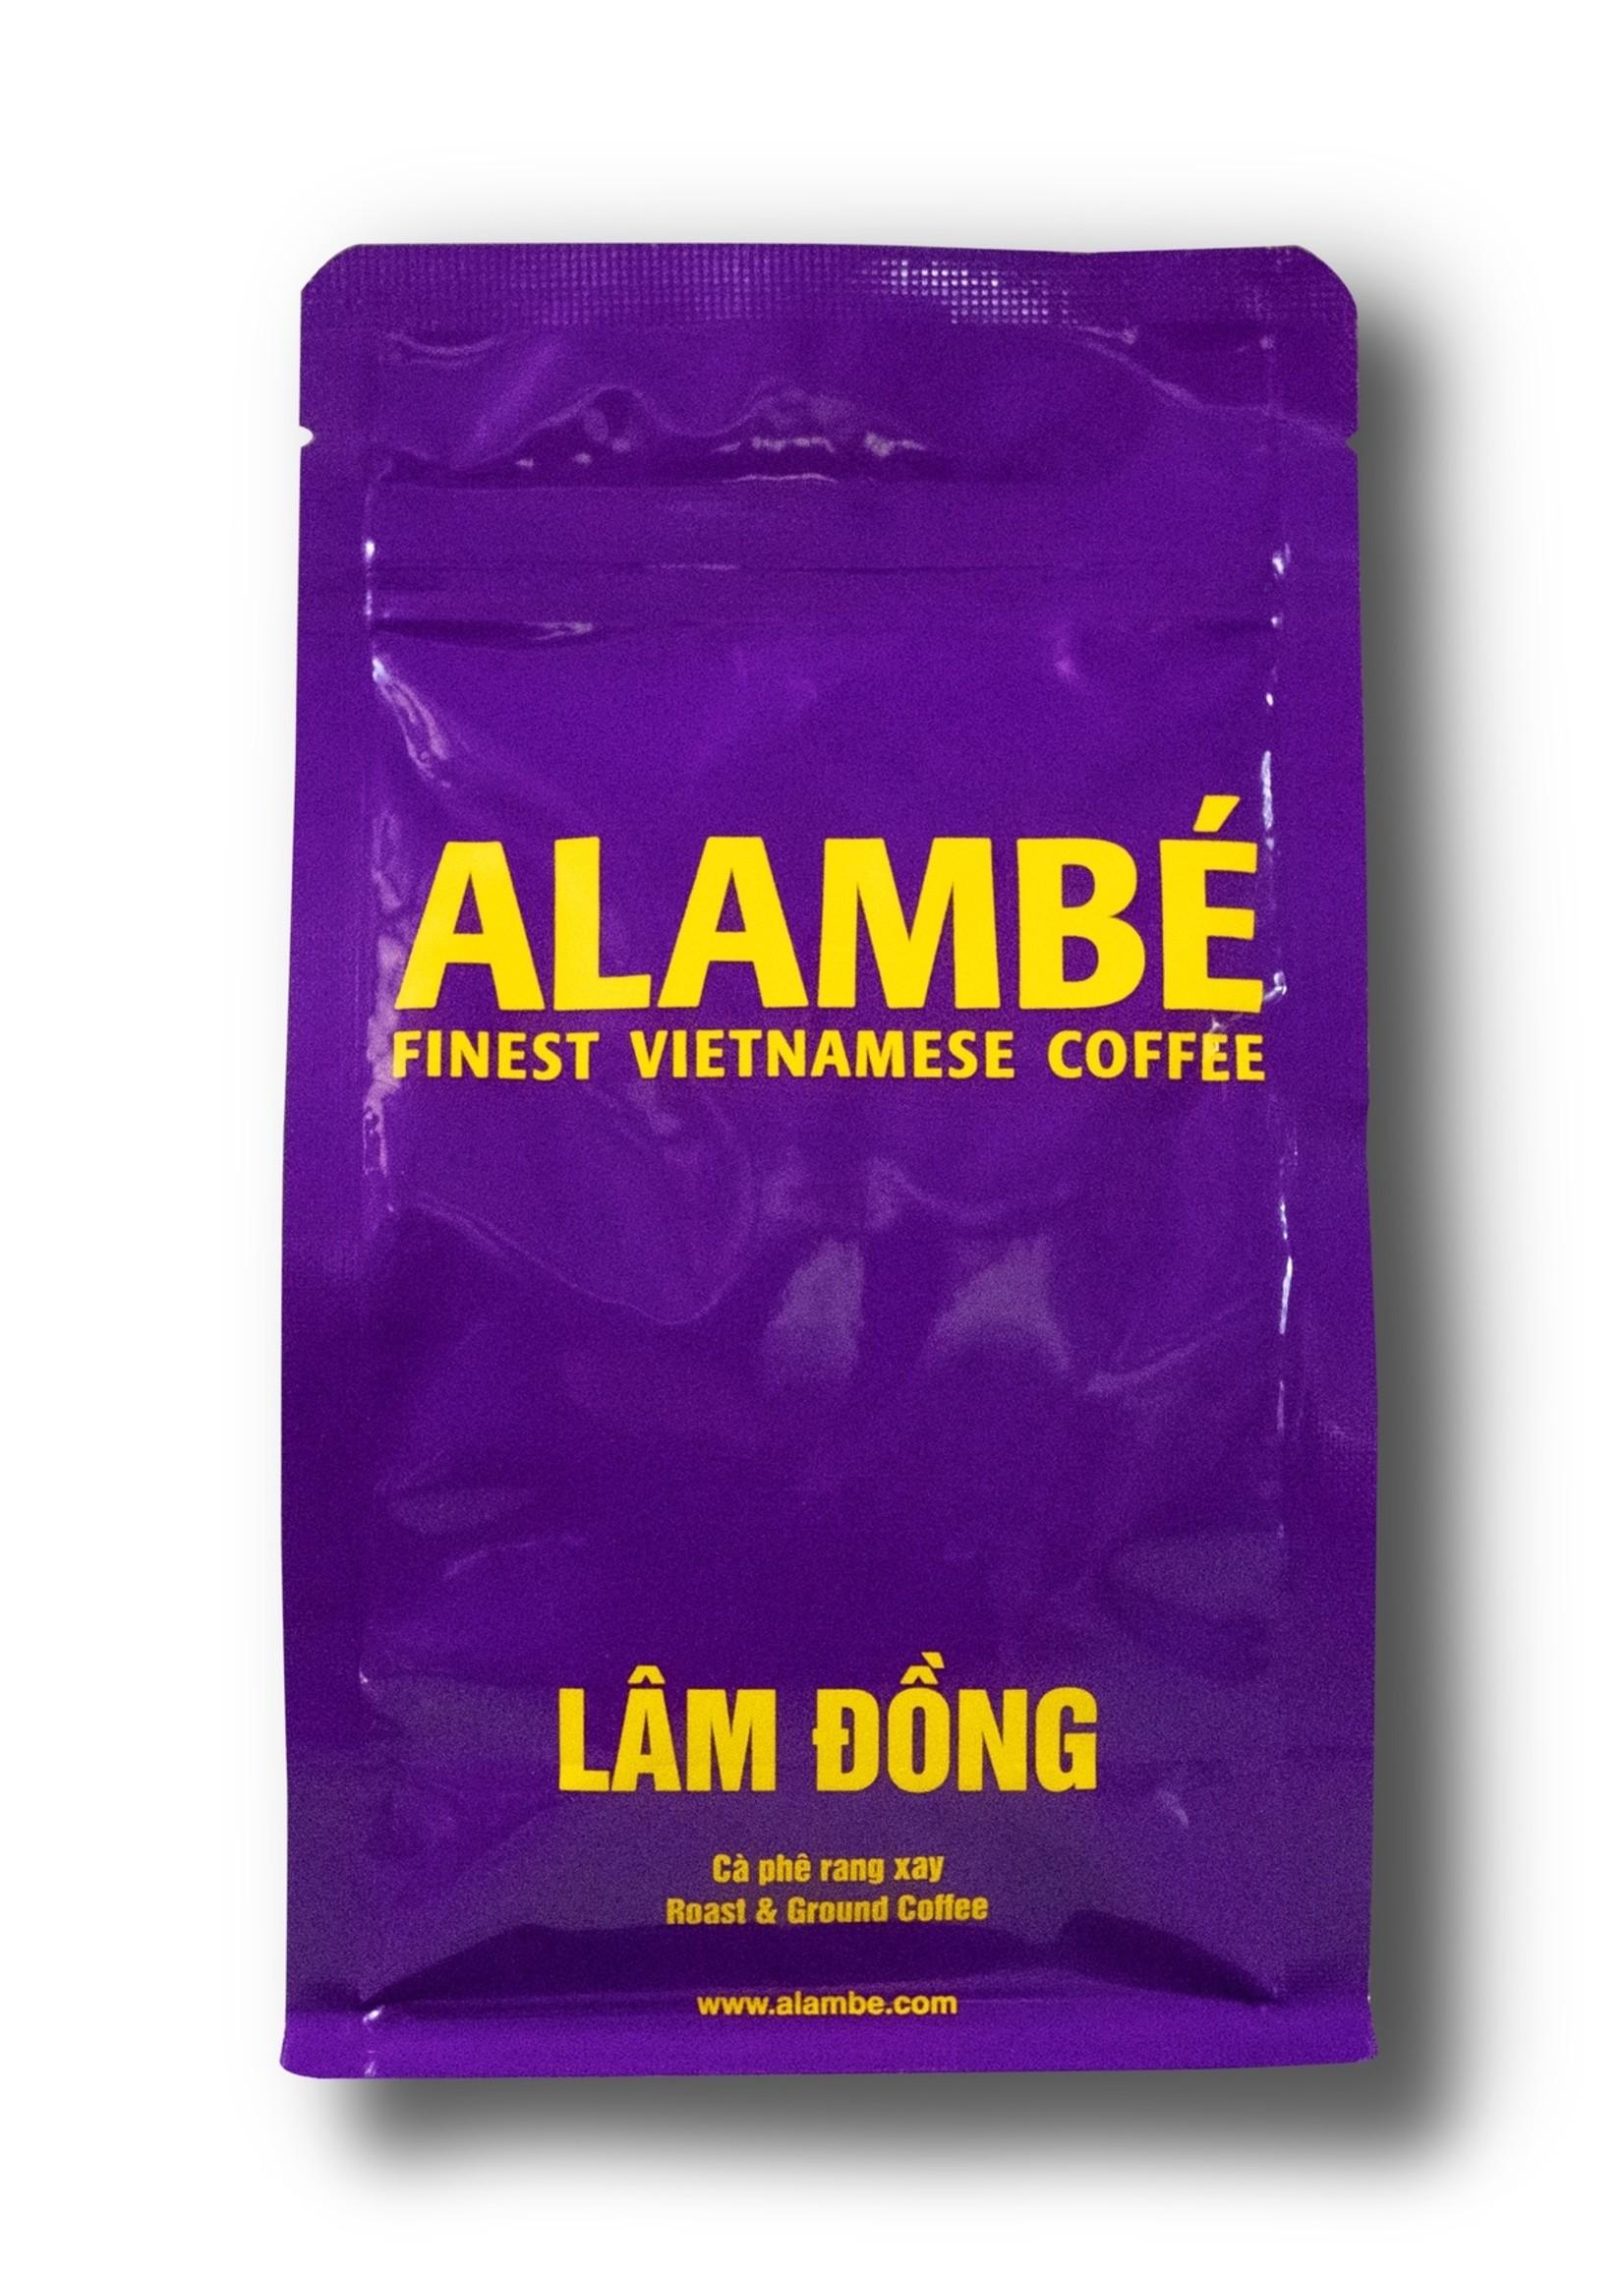 Alambé - Finest Vietnamese Coffee Lam Dong - Italian style house blend (230g ground)